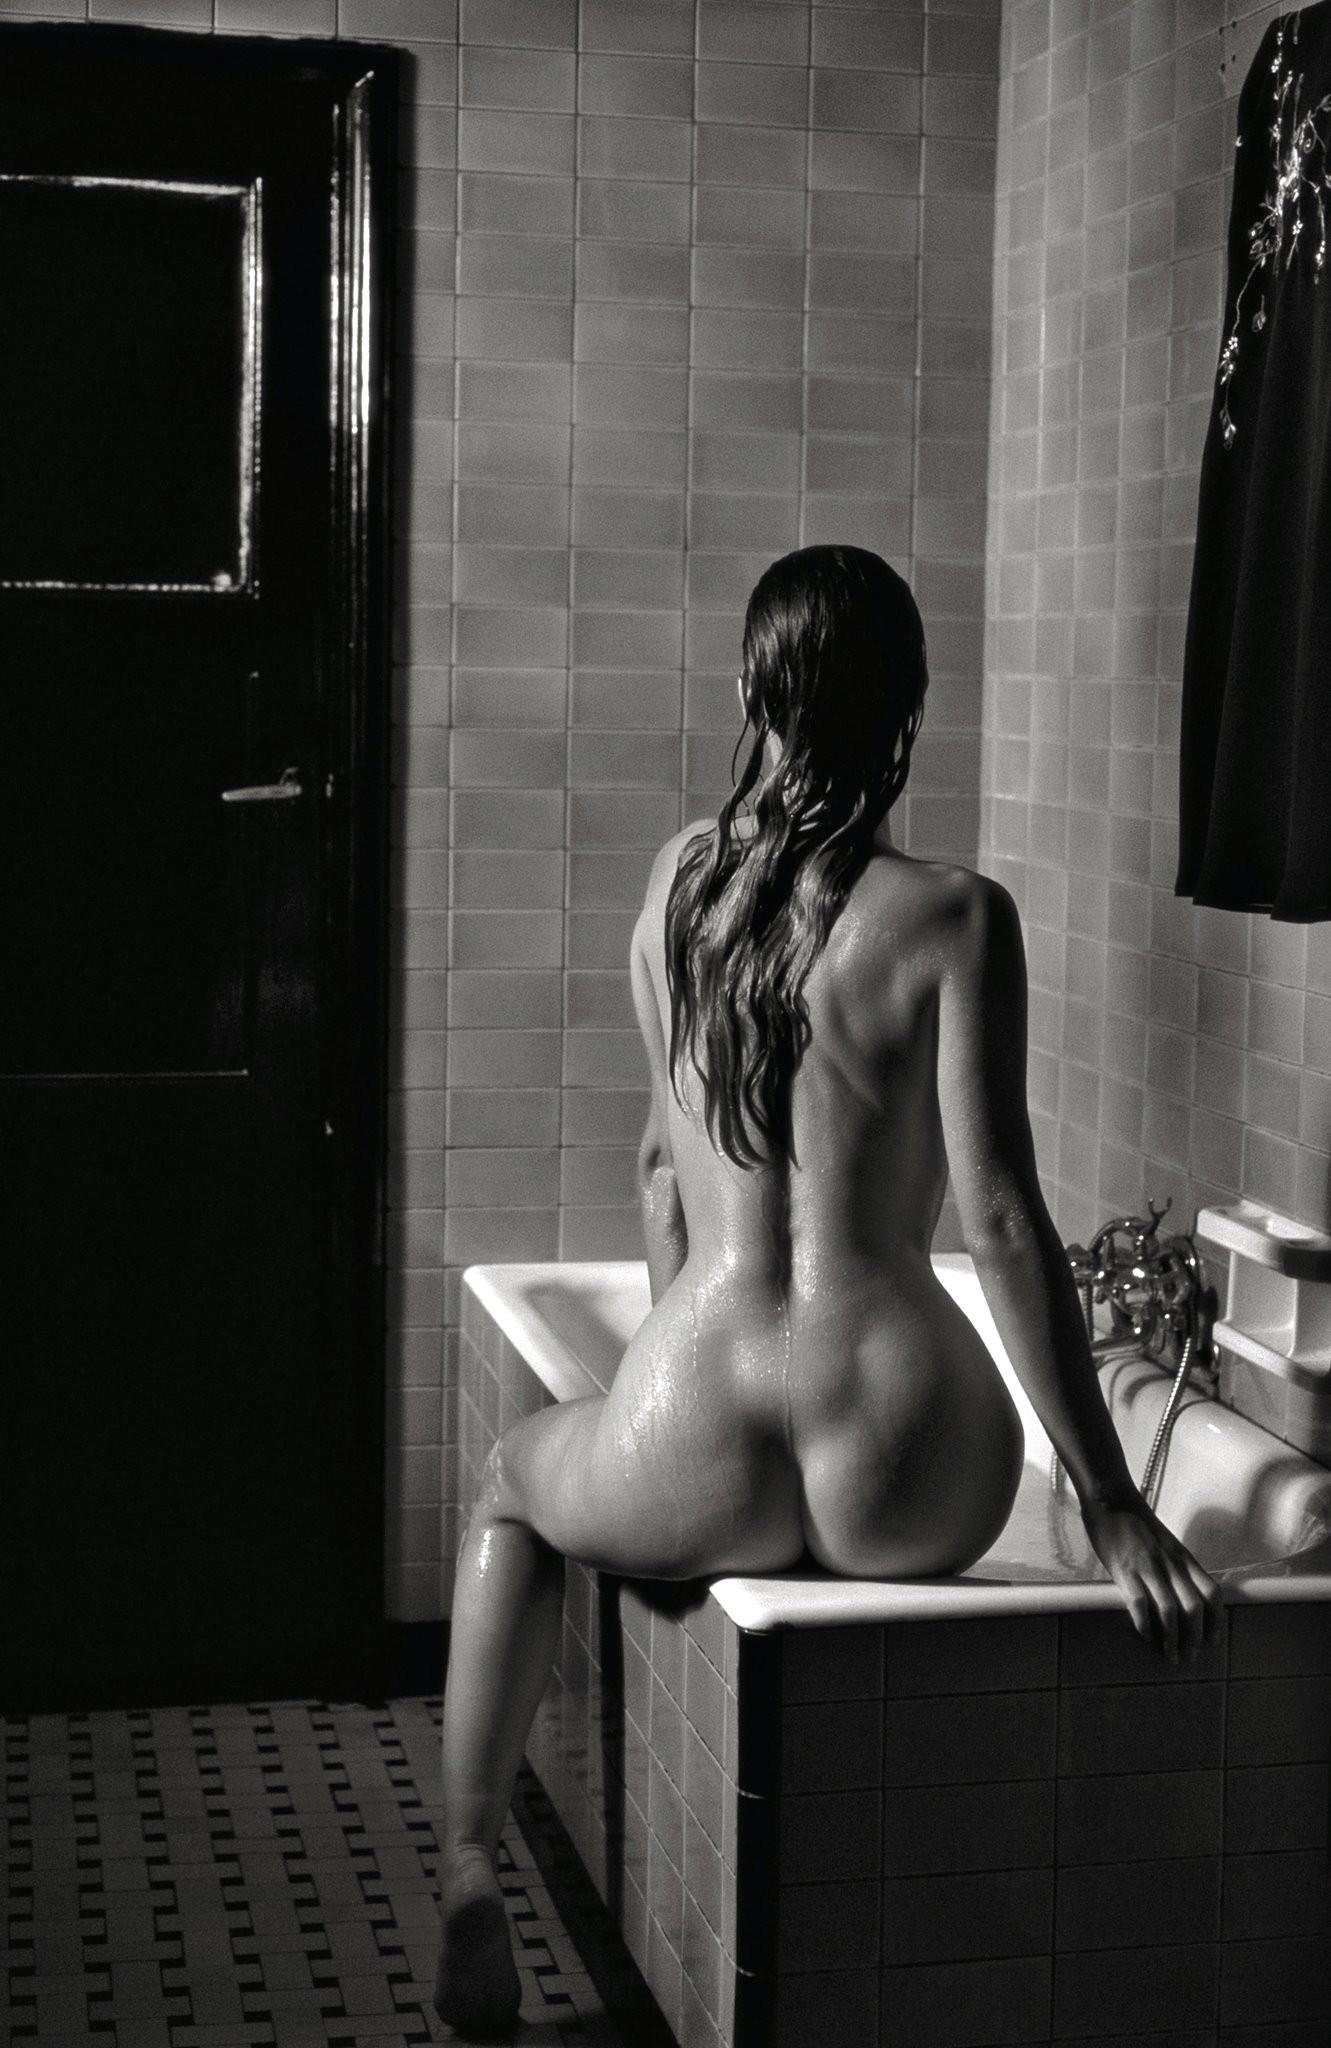 Ванна. Фотограф Alain Daussin